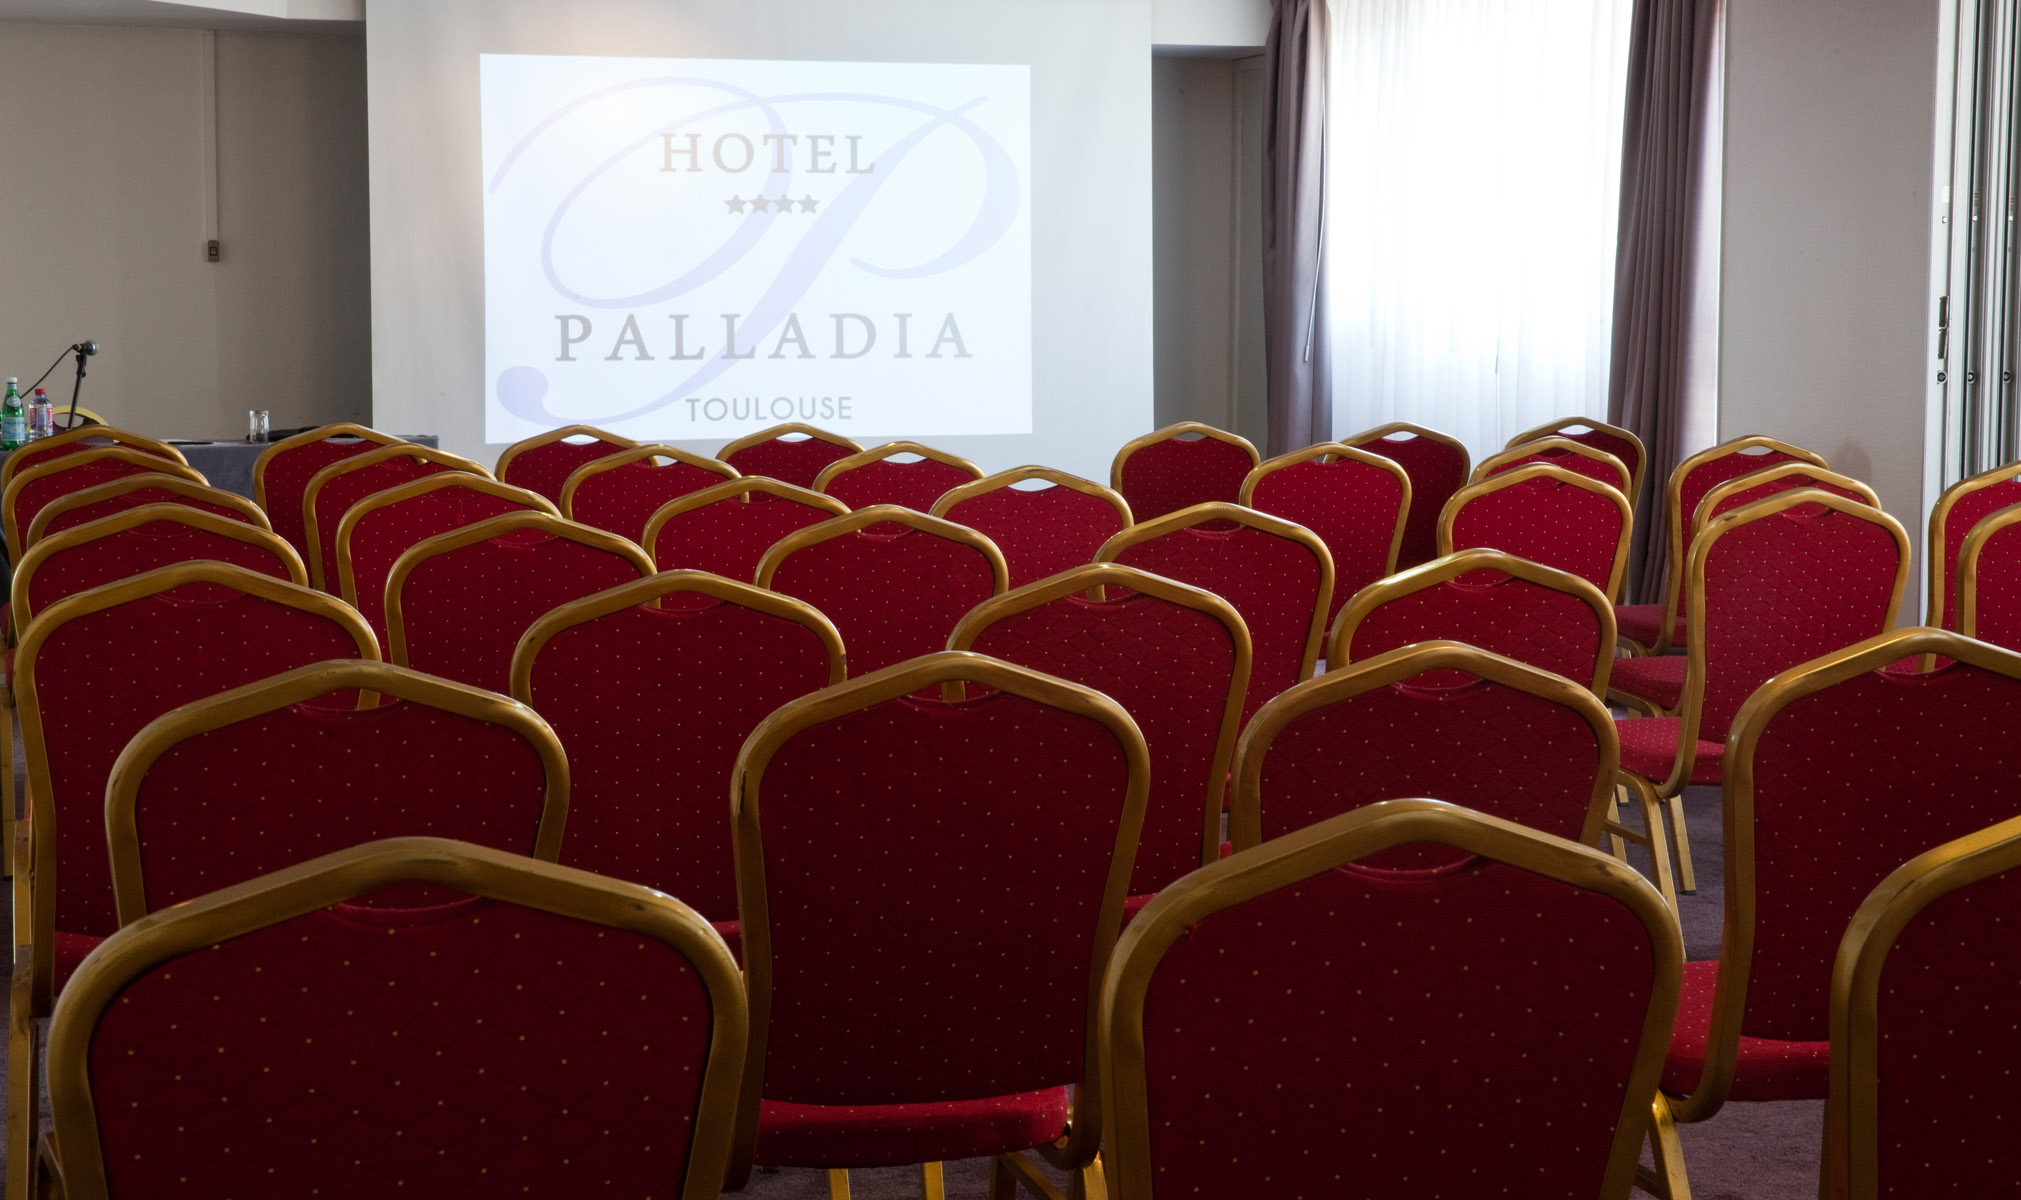 salle séminaire hotel palladia toulouse